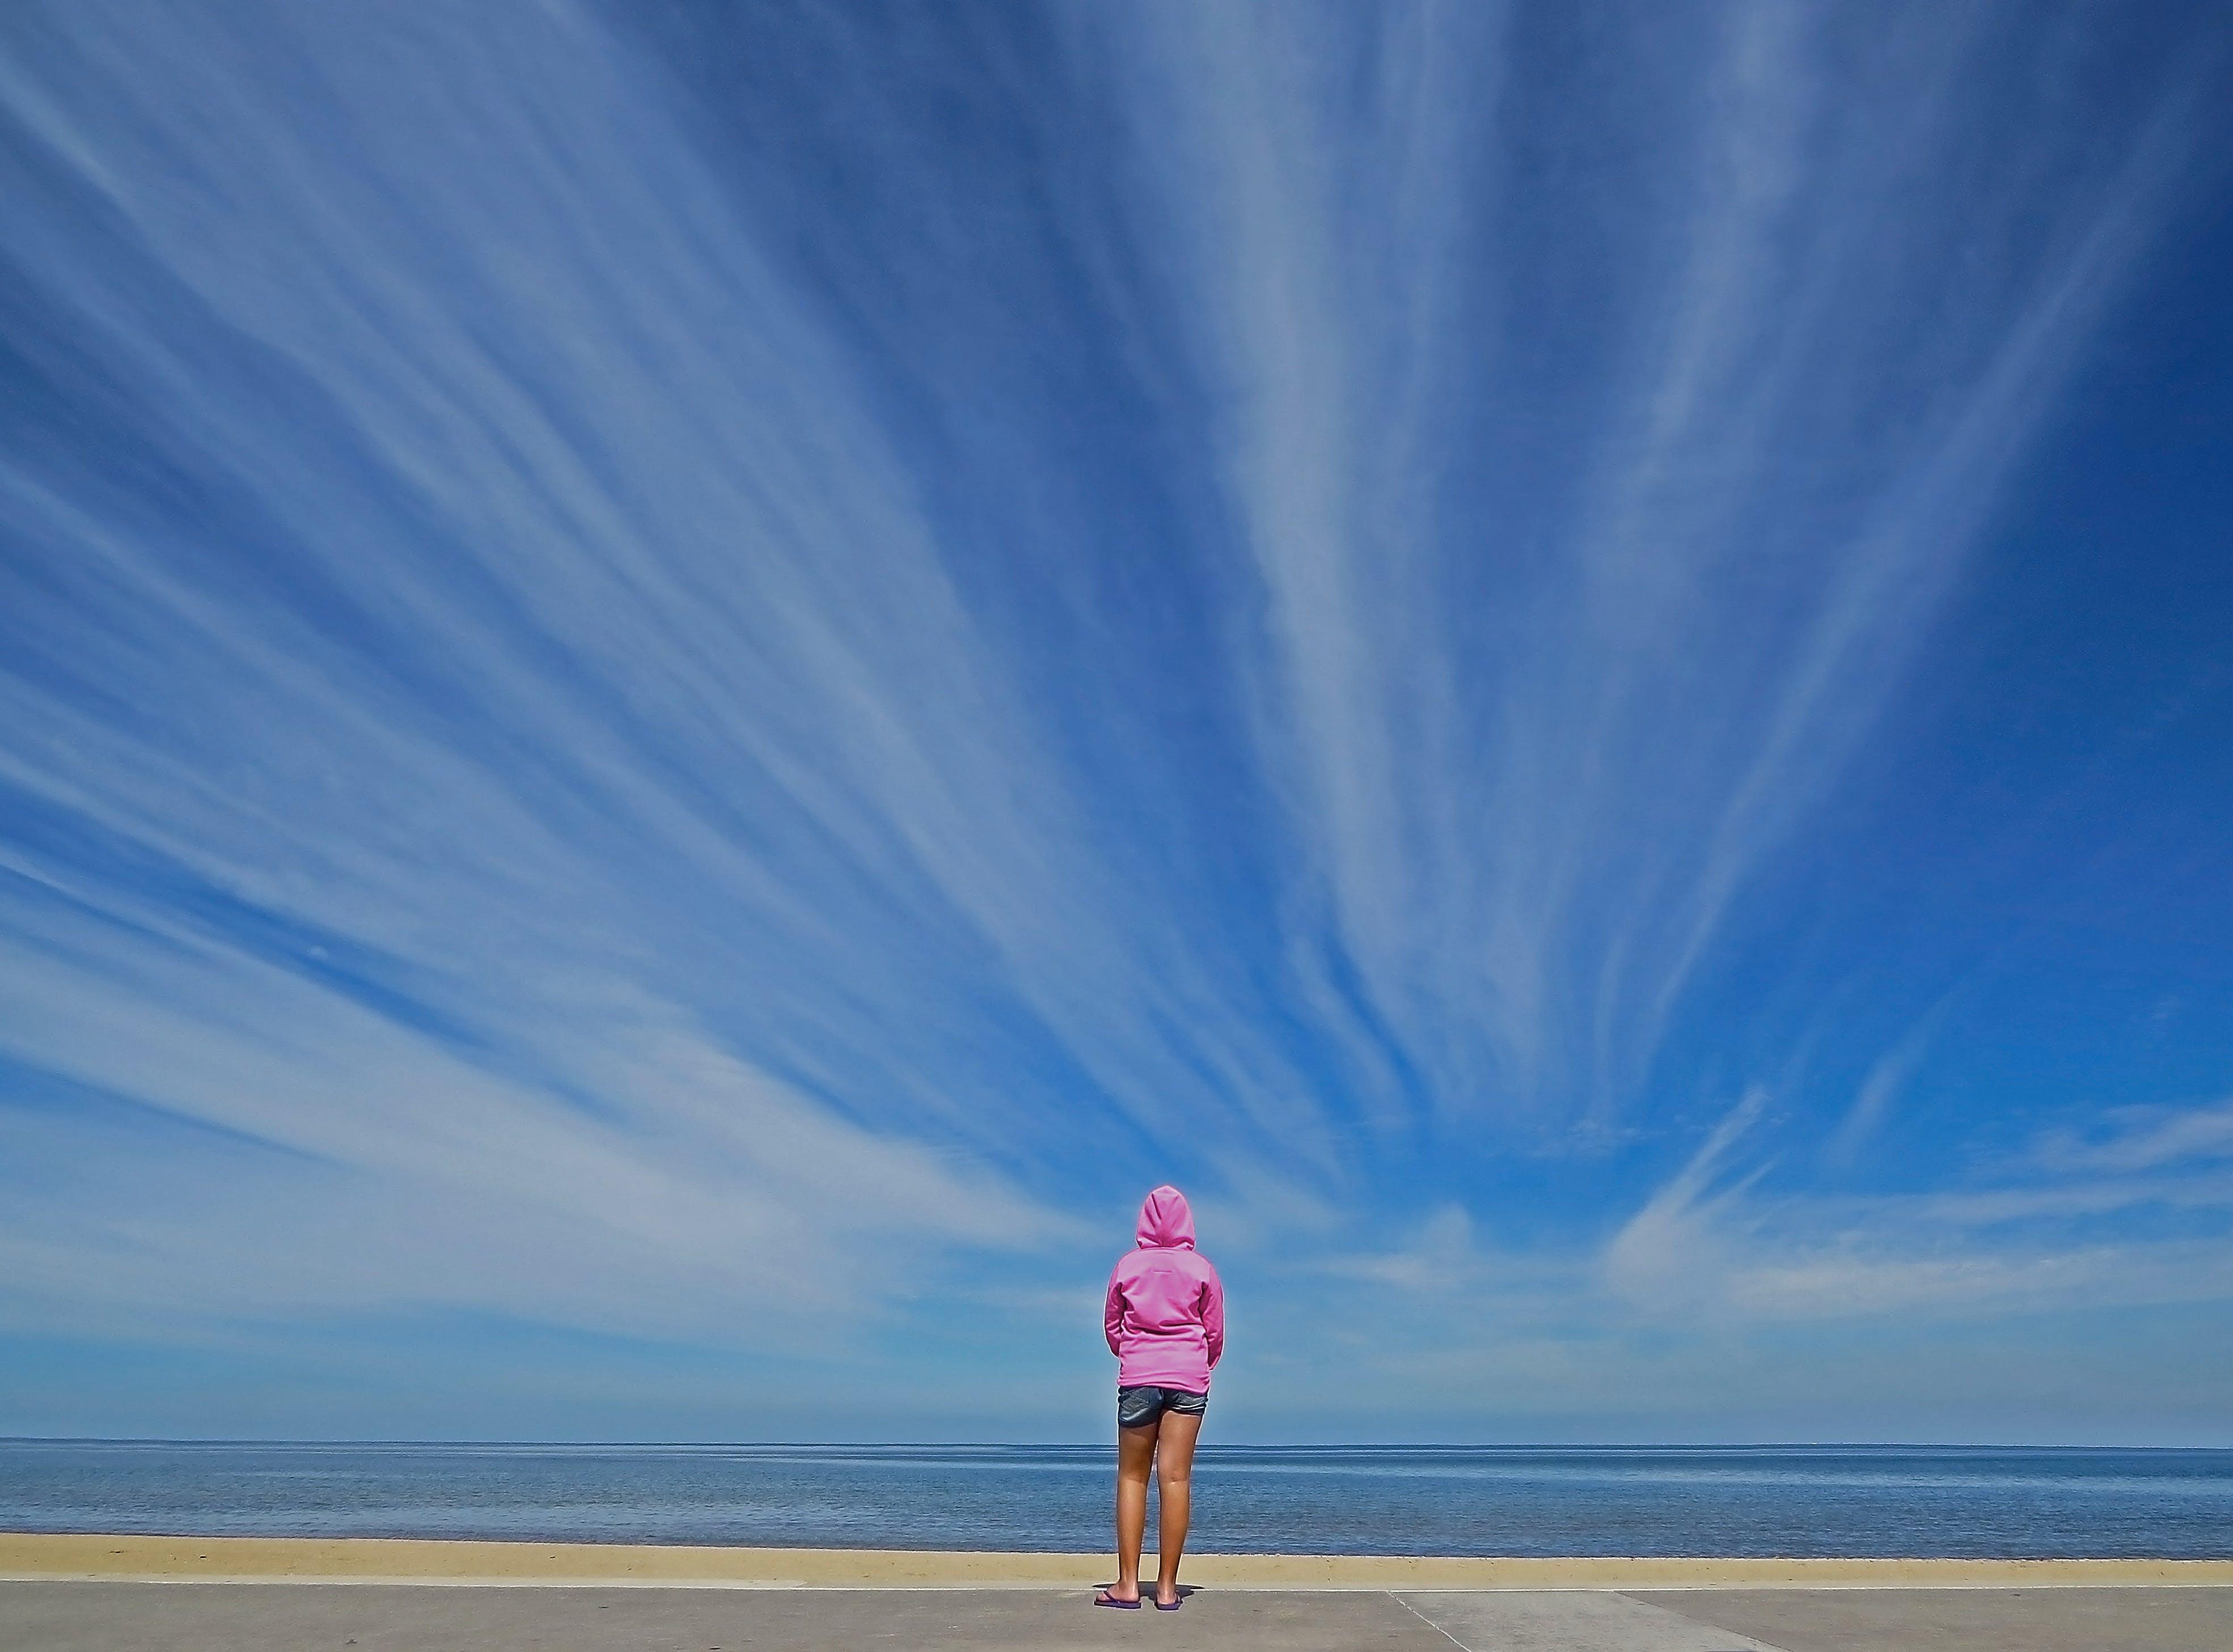 Woman Standing in Front of Seashore